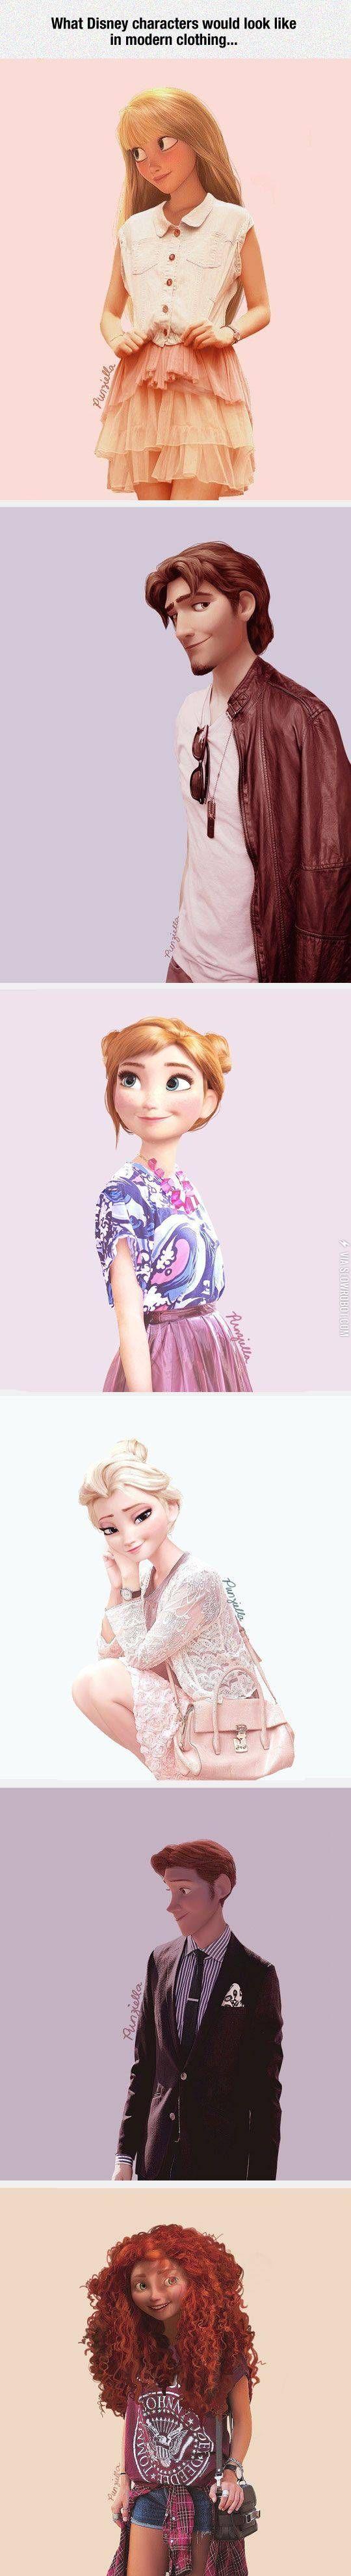 697 best Disney & movies images on Pinterest